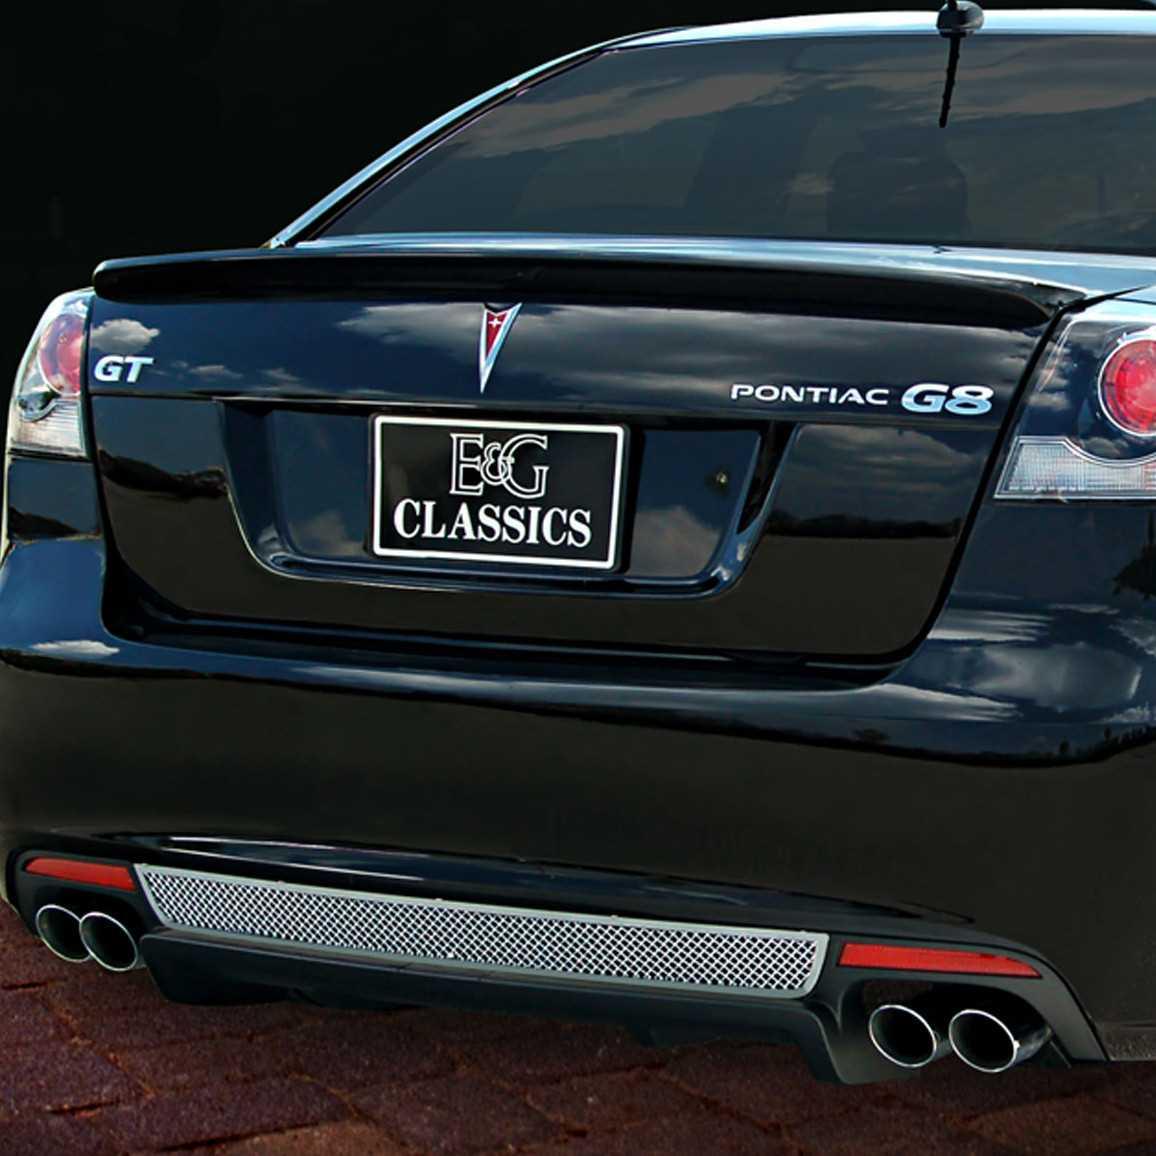 E Amp G Classics 2008 2009 Pontiac G8 Grille Rear Valance Mesh